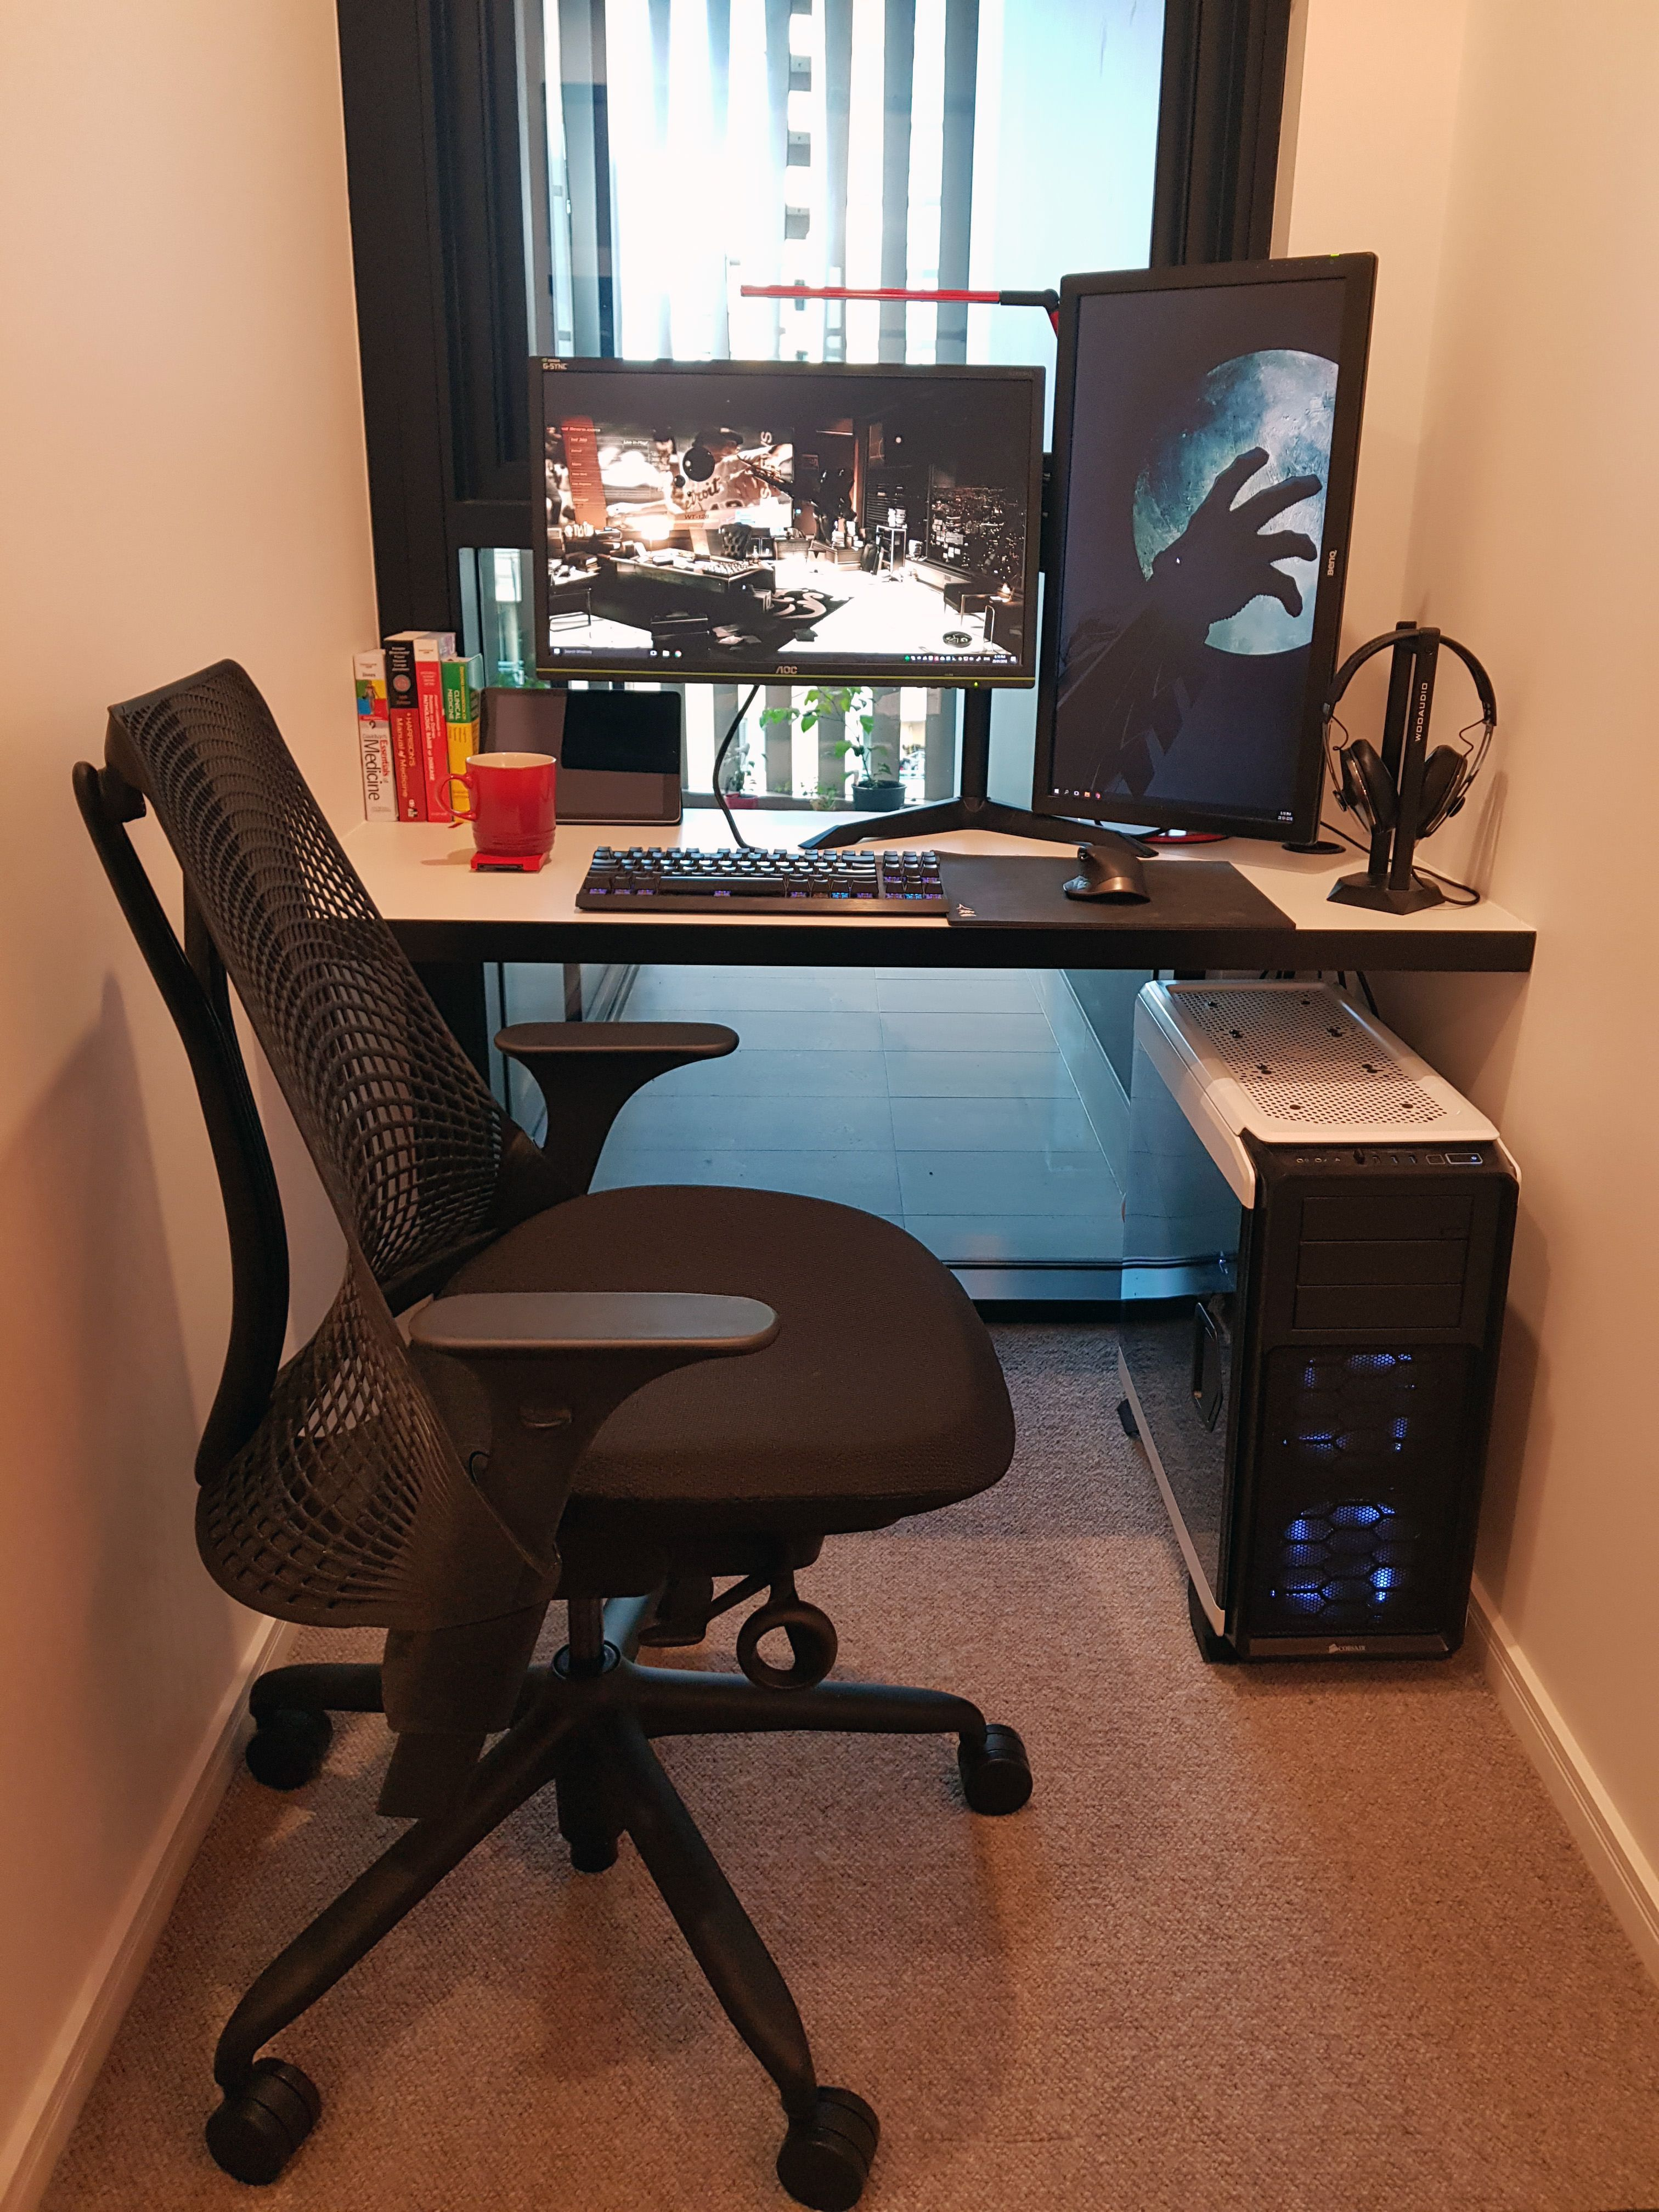 27 Diy Computer Desk Ideas You Can Build Now In 2019 Espaco De